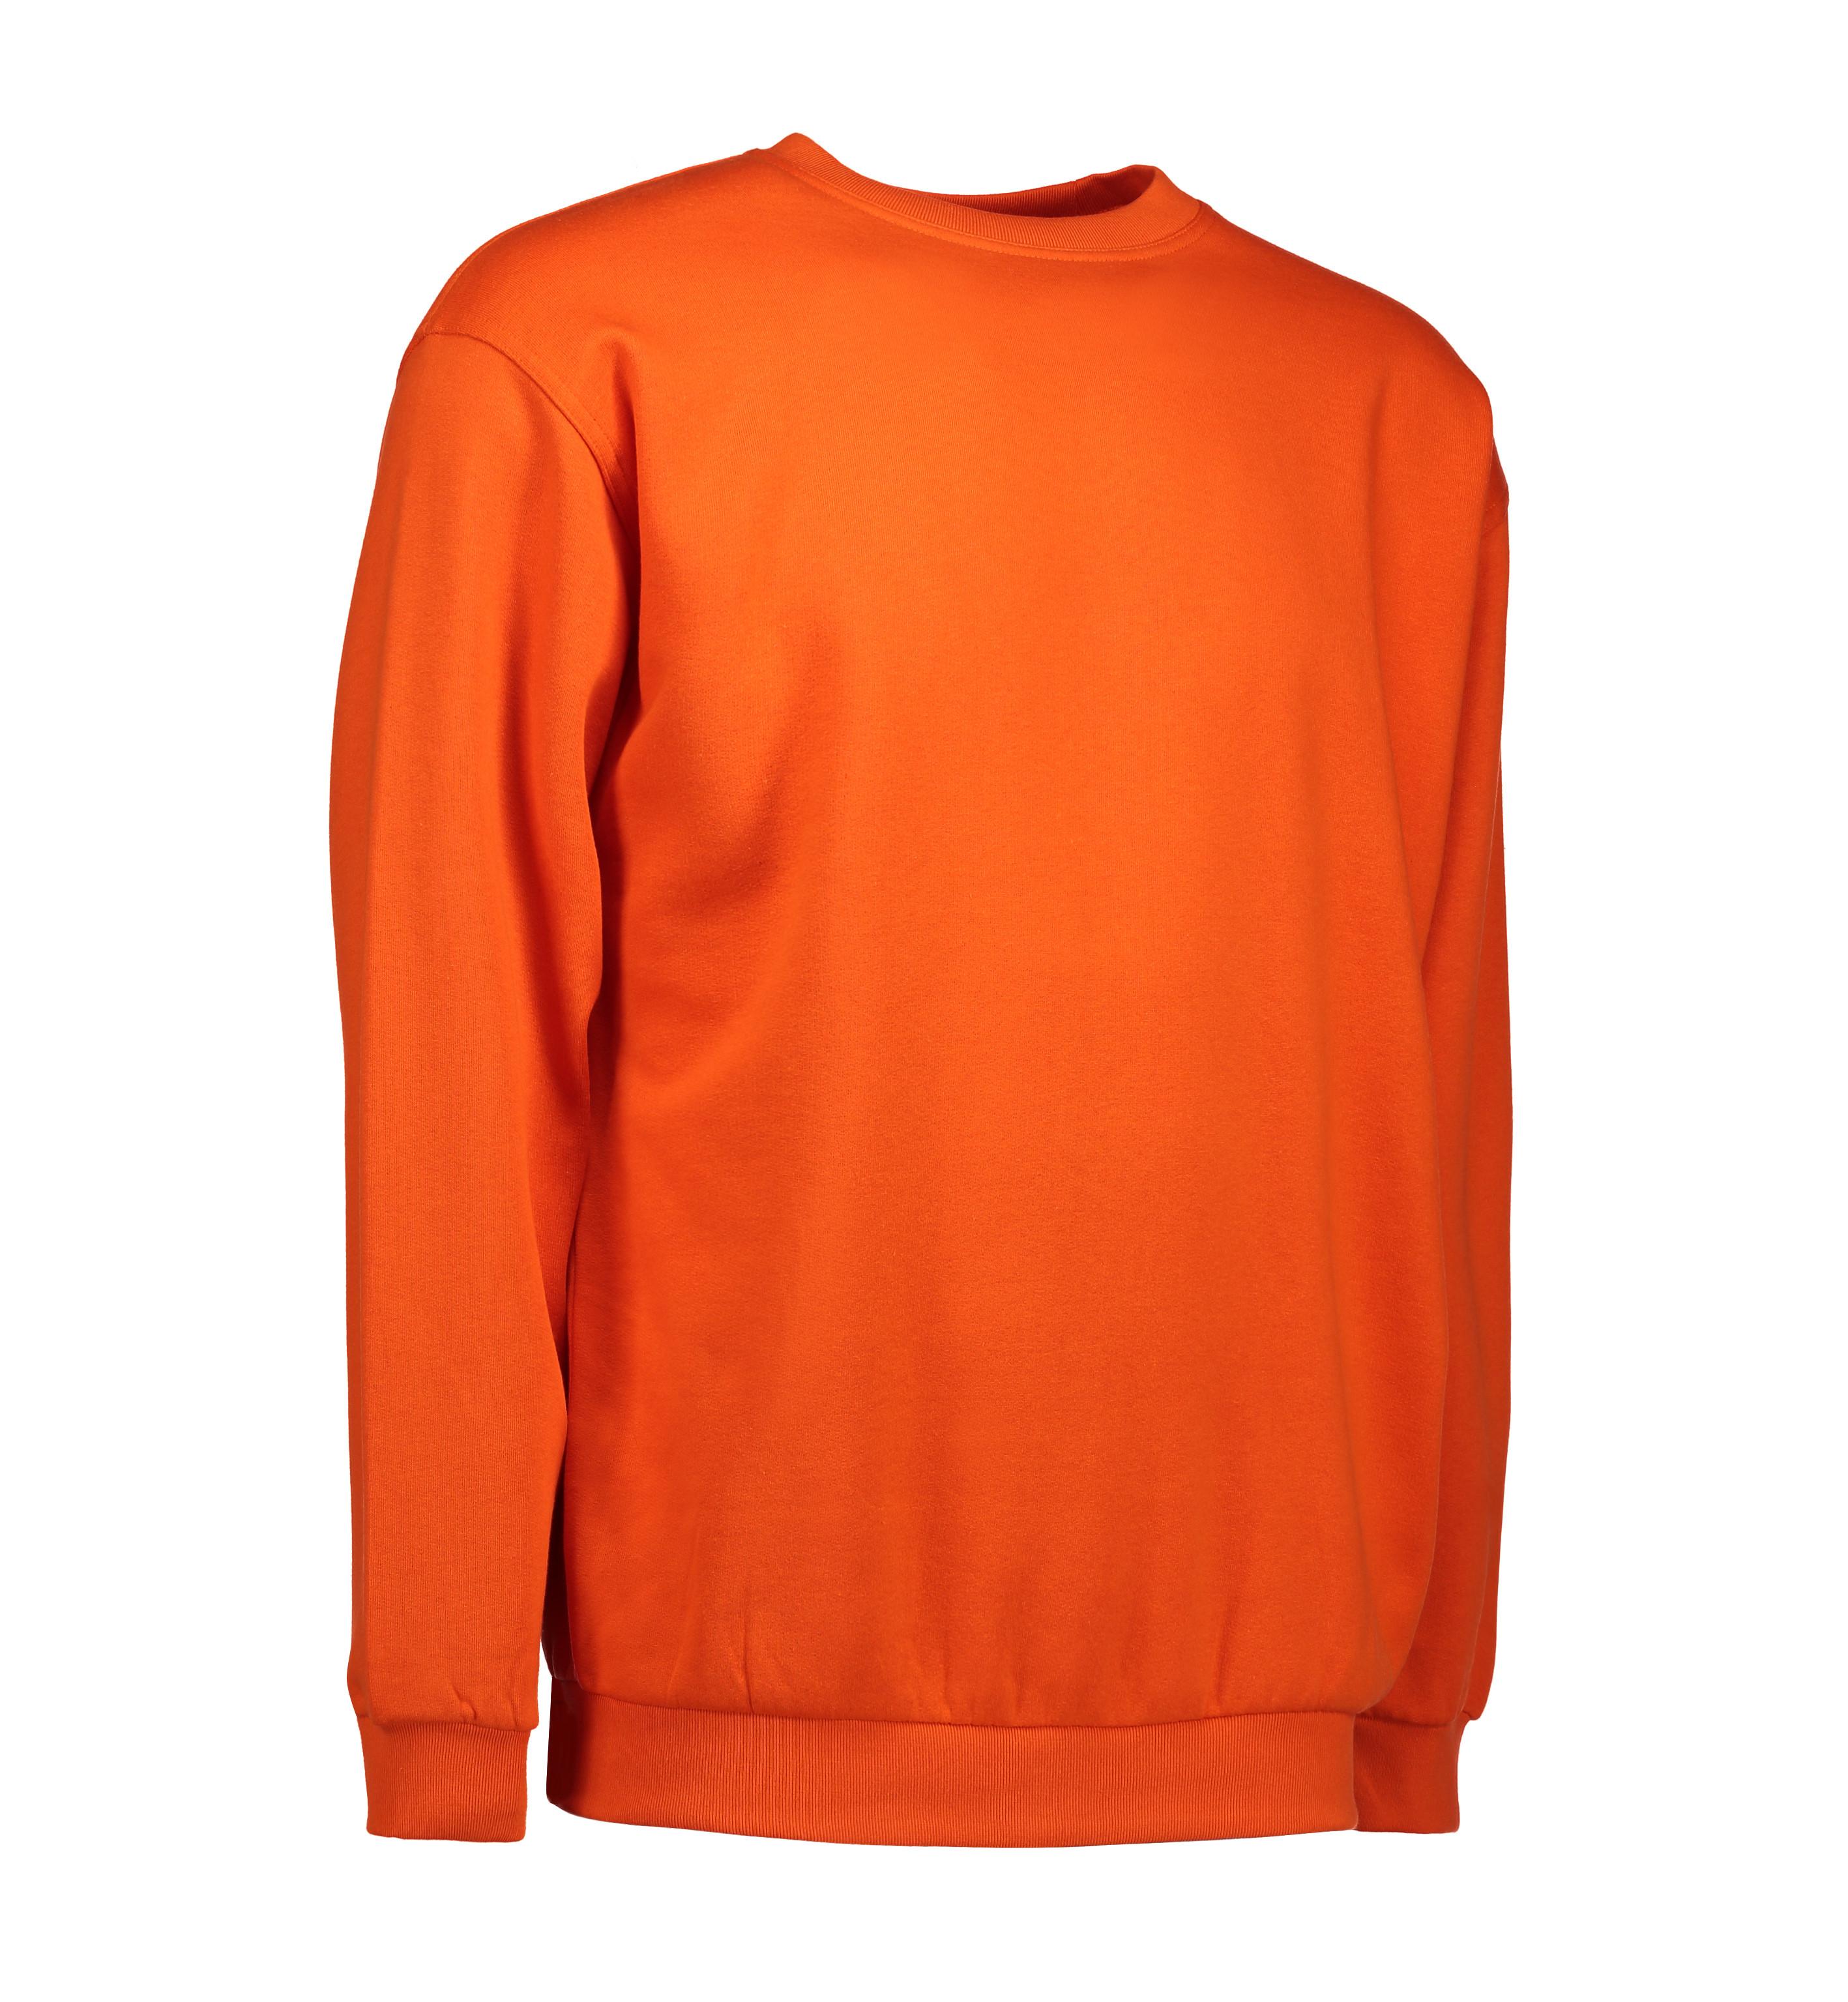 ID - Sweatshirt, 0600 - Orange